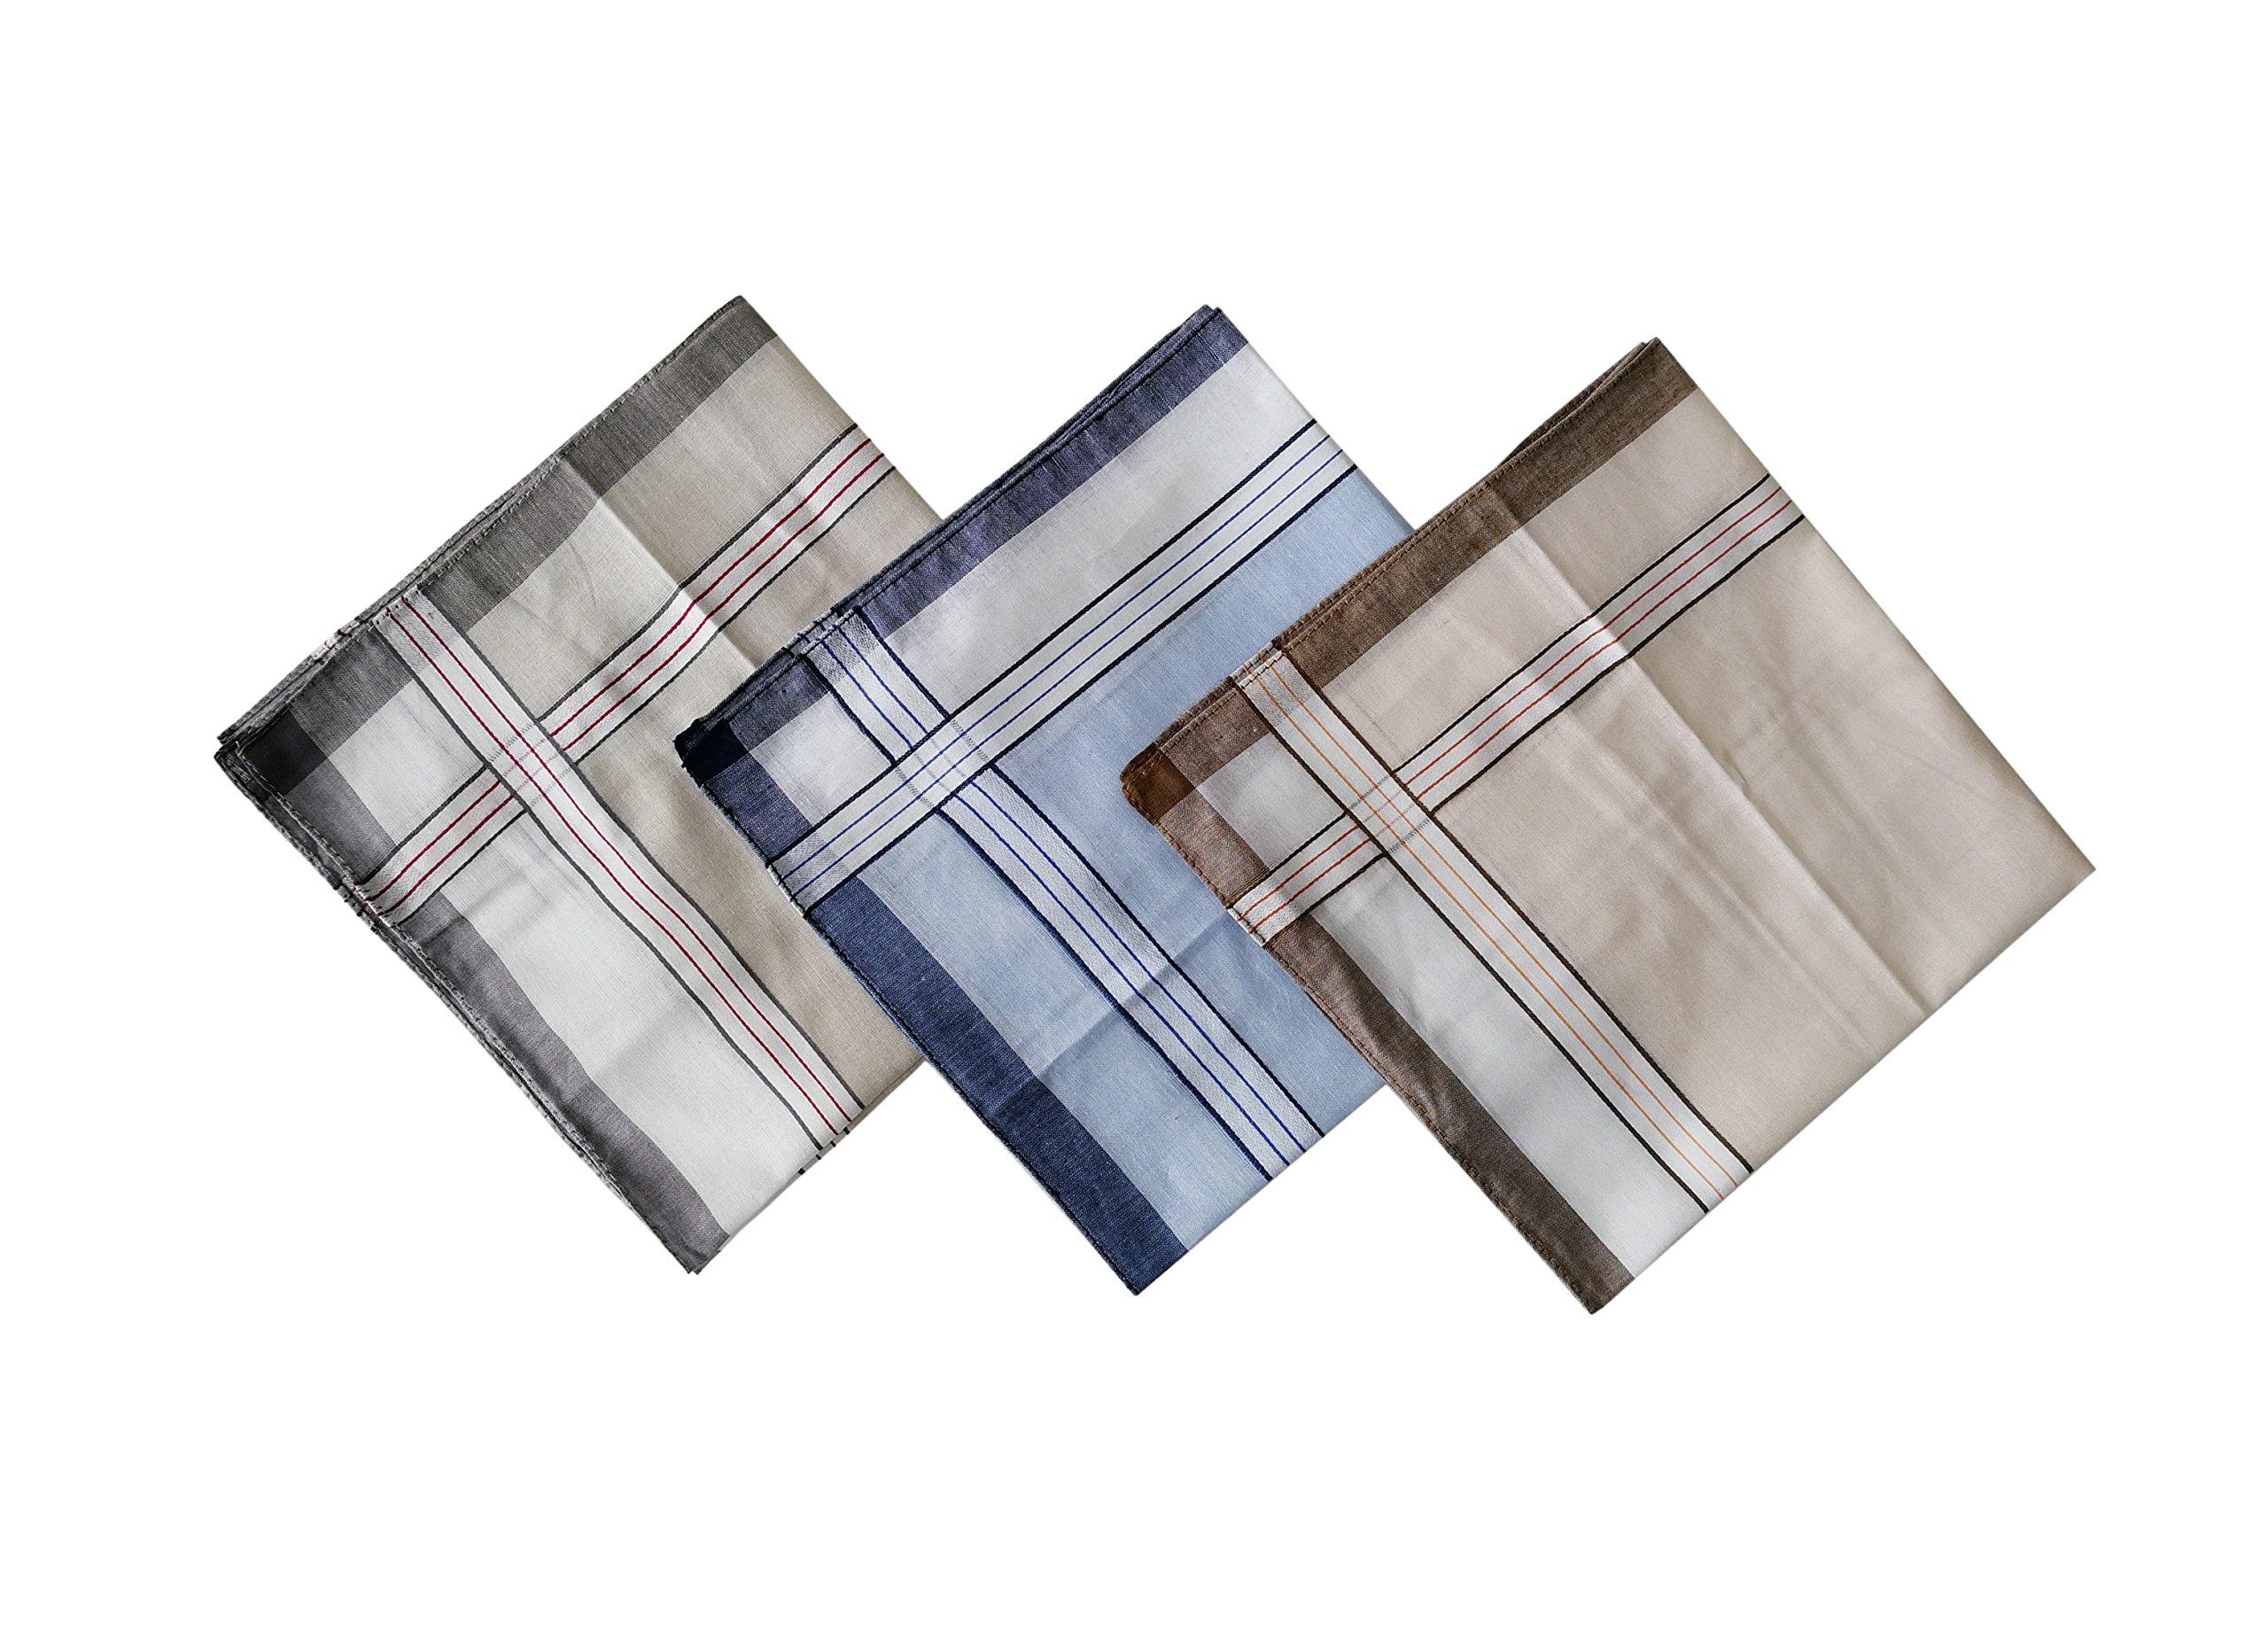 12PCS KINGREE Mens and Boys Gentleman Vintage Casual Hankie Cotton Handkerchiefs, 100% Cotton Men's Handkerchief (12PCS-Mix22)